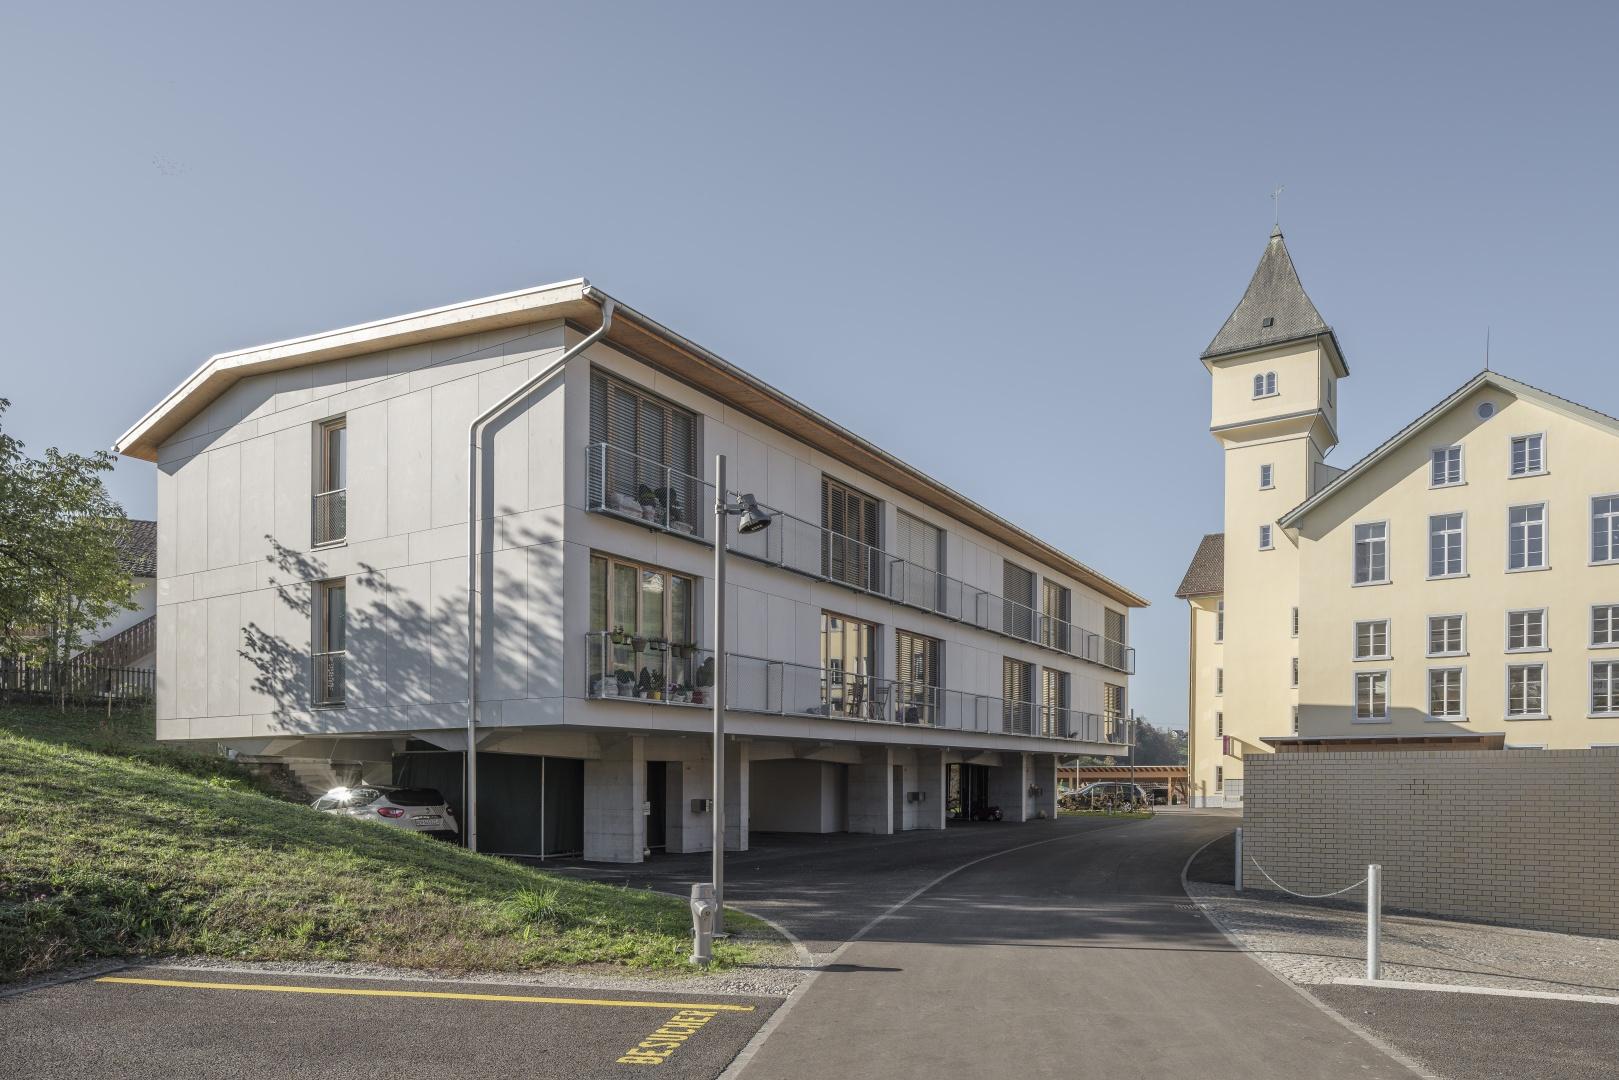 Vue extérieure © moos giuliani herrmann architekten, silvano pedrett